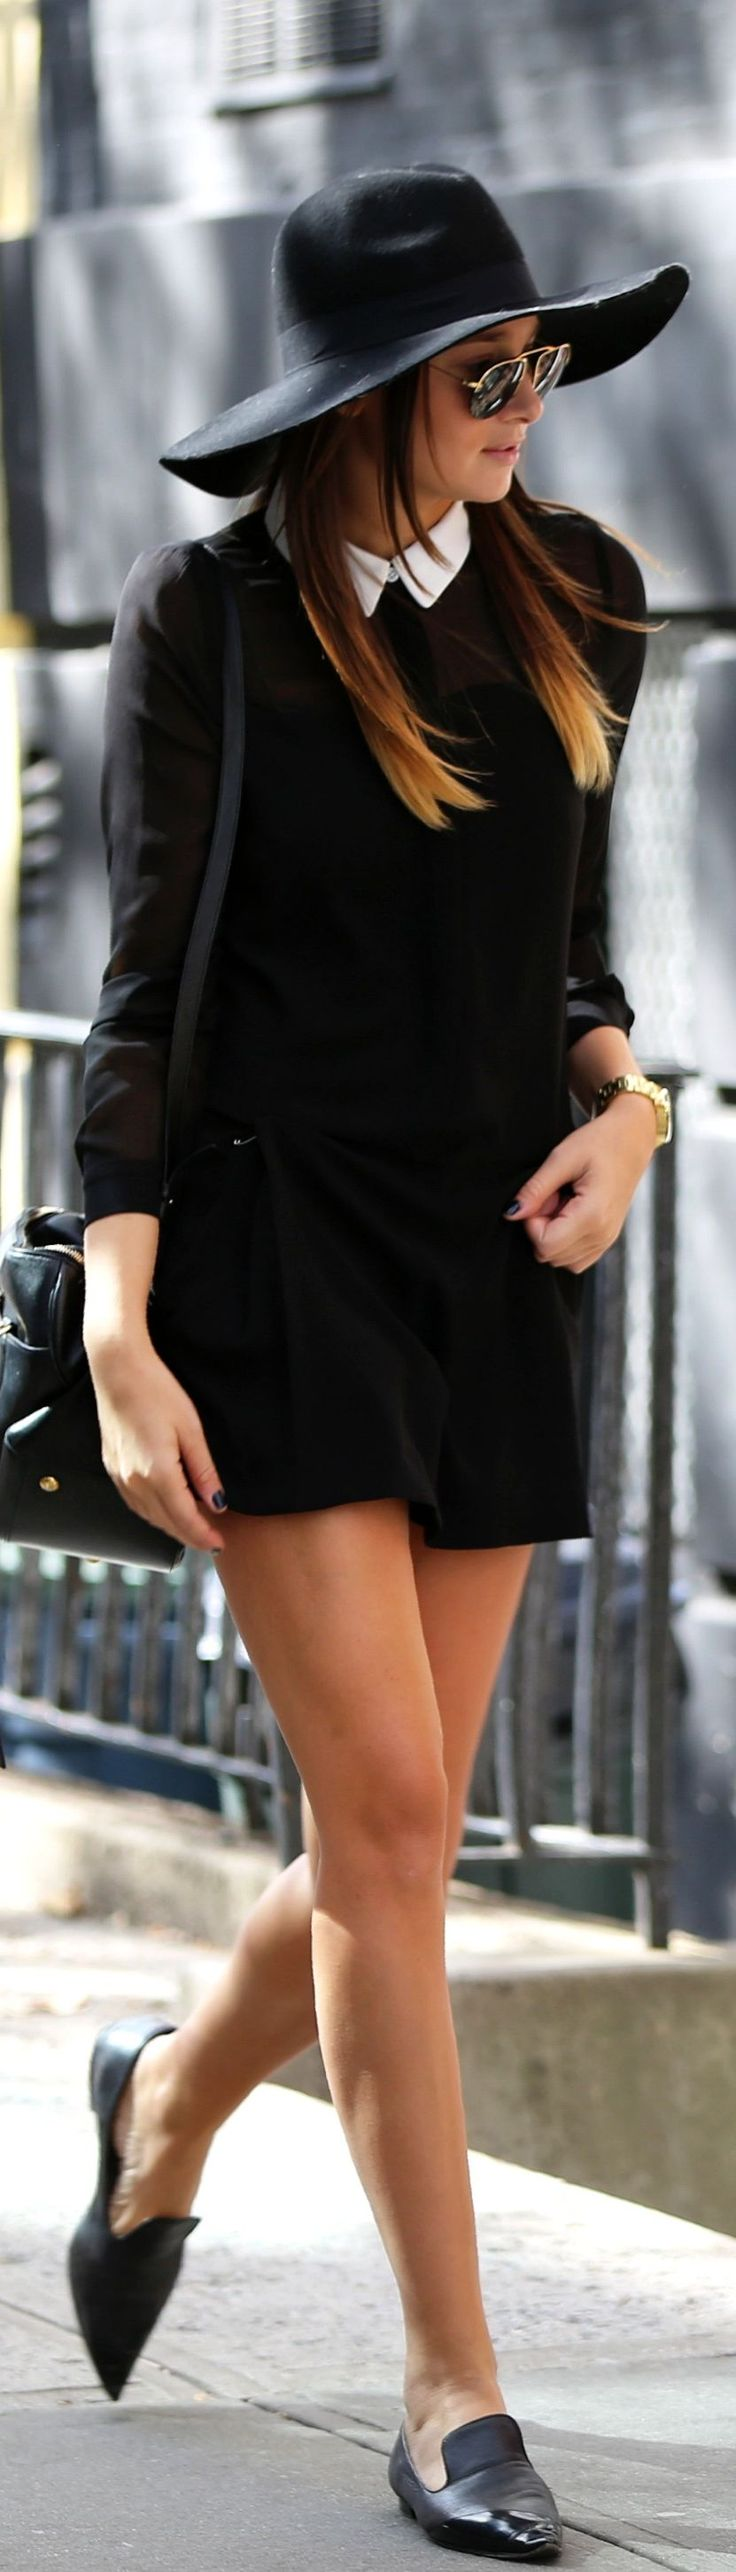 black dress, white peter pan collar, flats, floppy hat